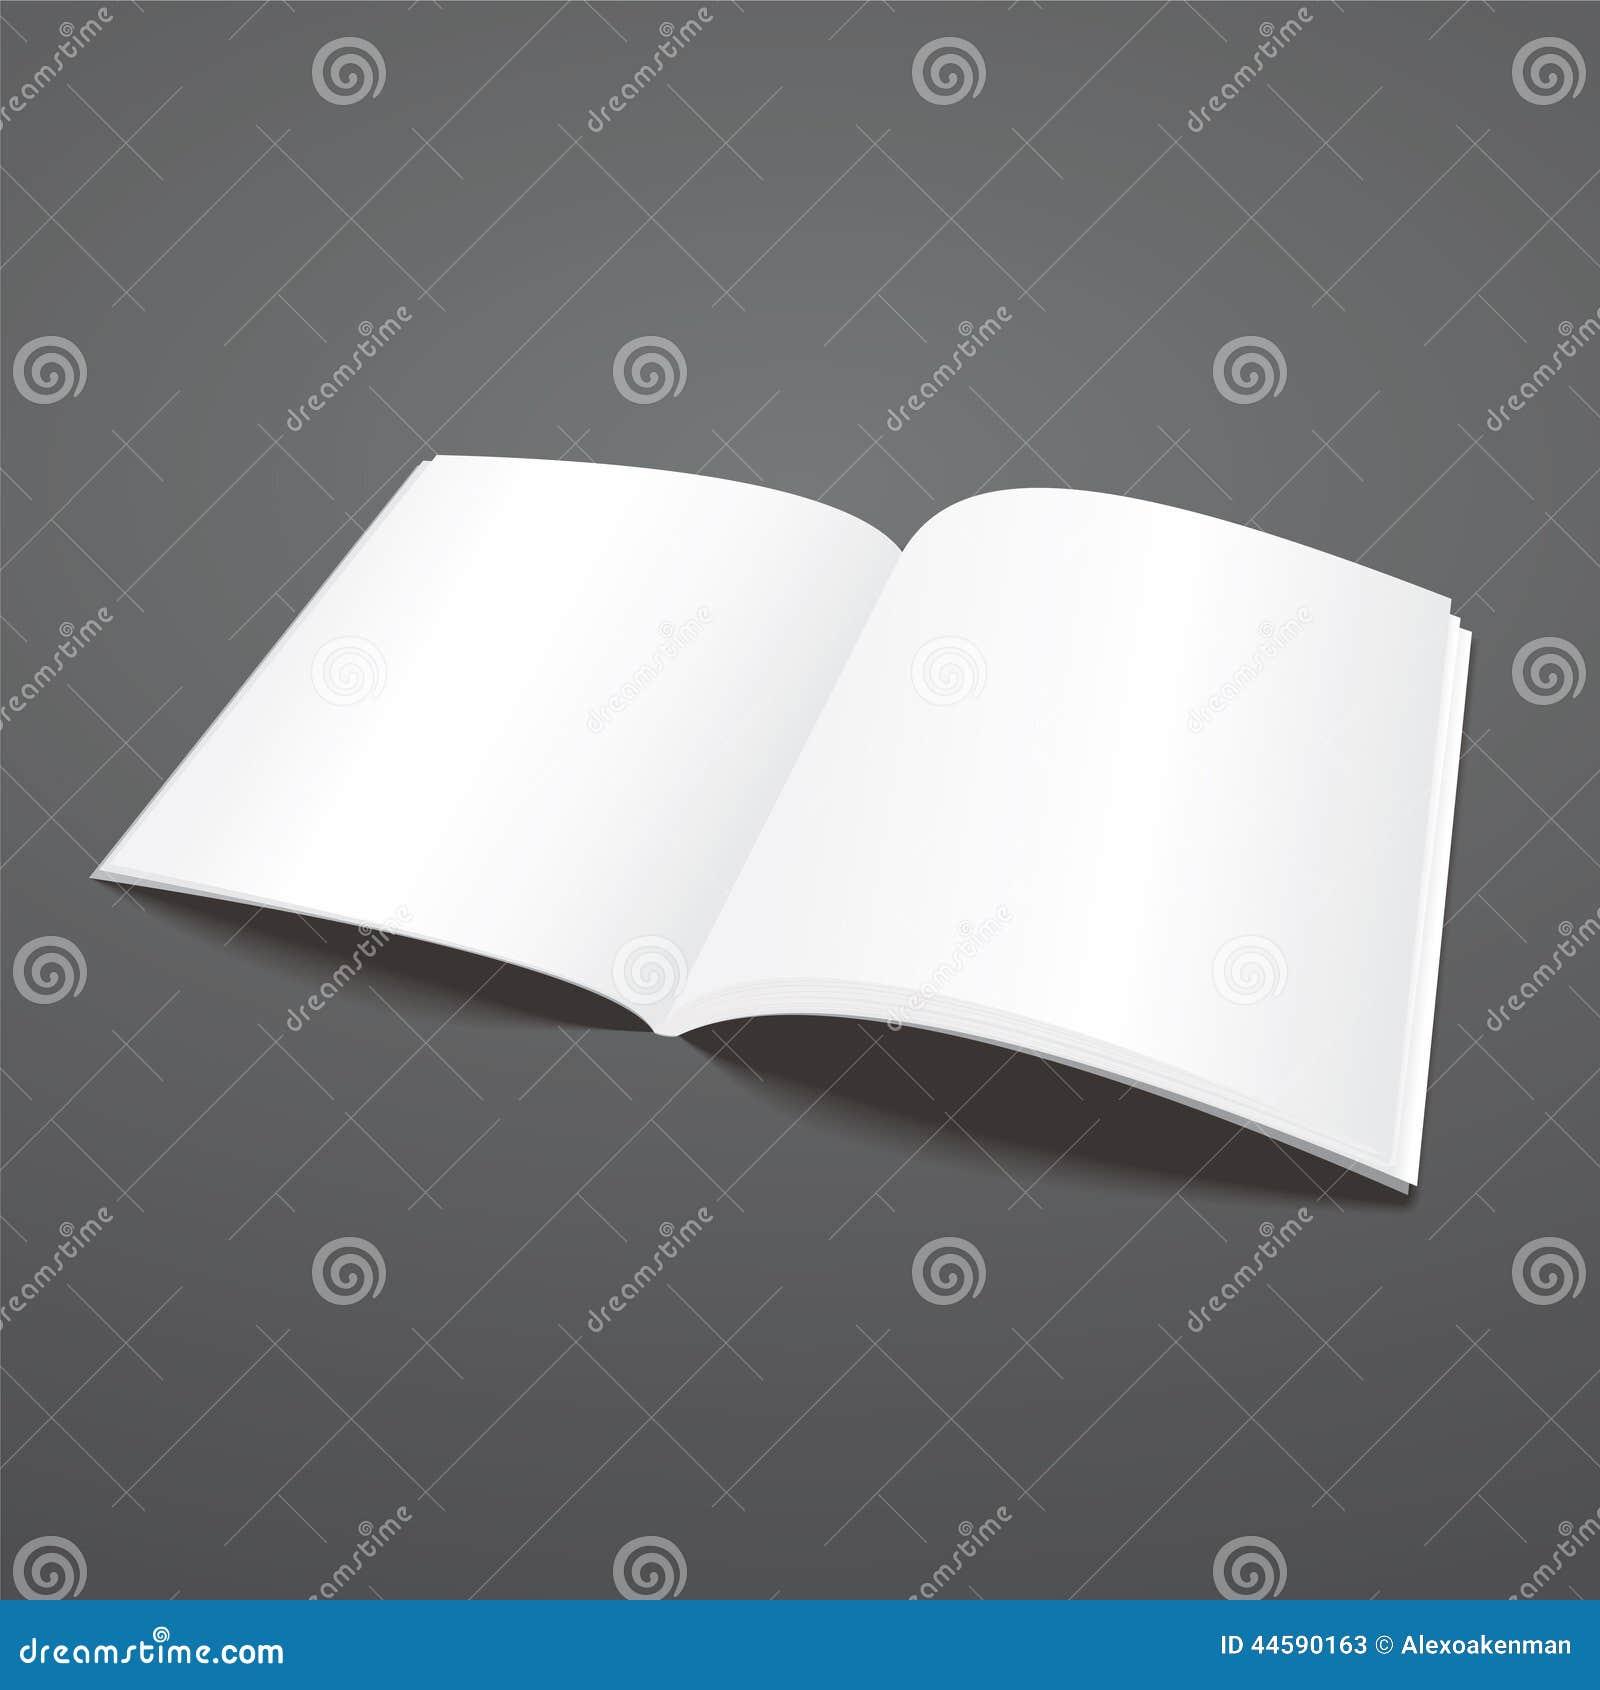 Blank Vector Open Magazine Template Stock Vector - Image ...